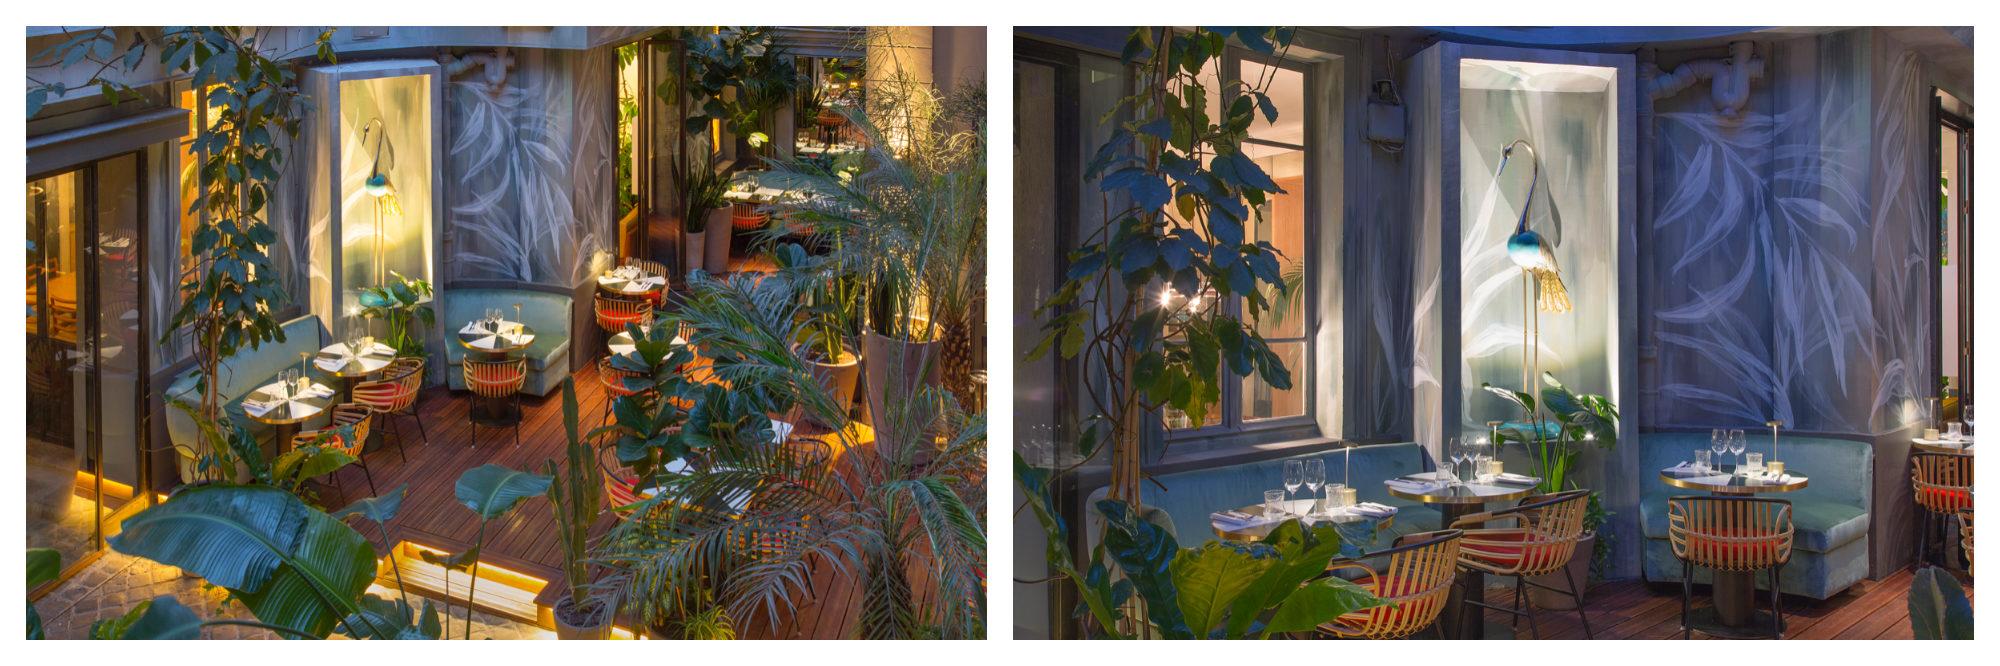 The indoor sinter garden at Klay restaurant in Paris is a favorite place to eat in winter.